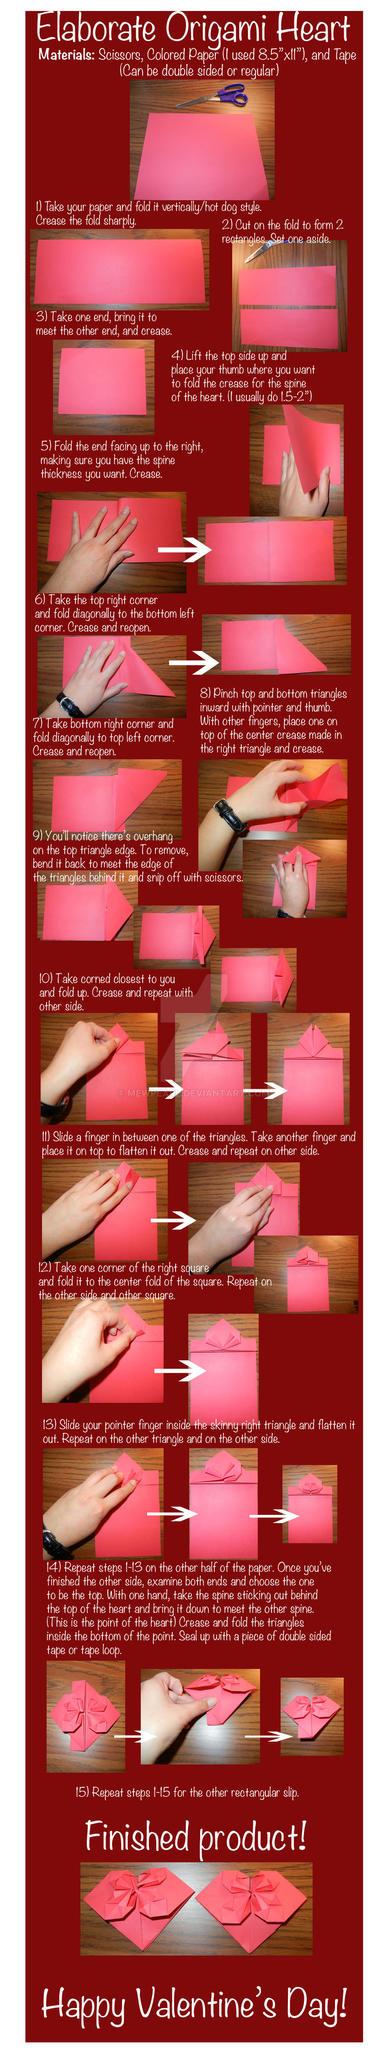 Elaborate Origami Heart Tutorial by mewpearl